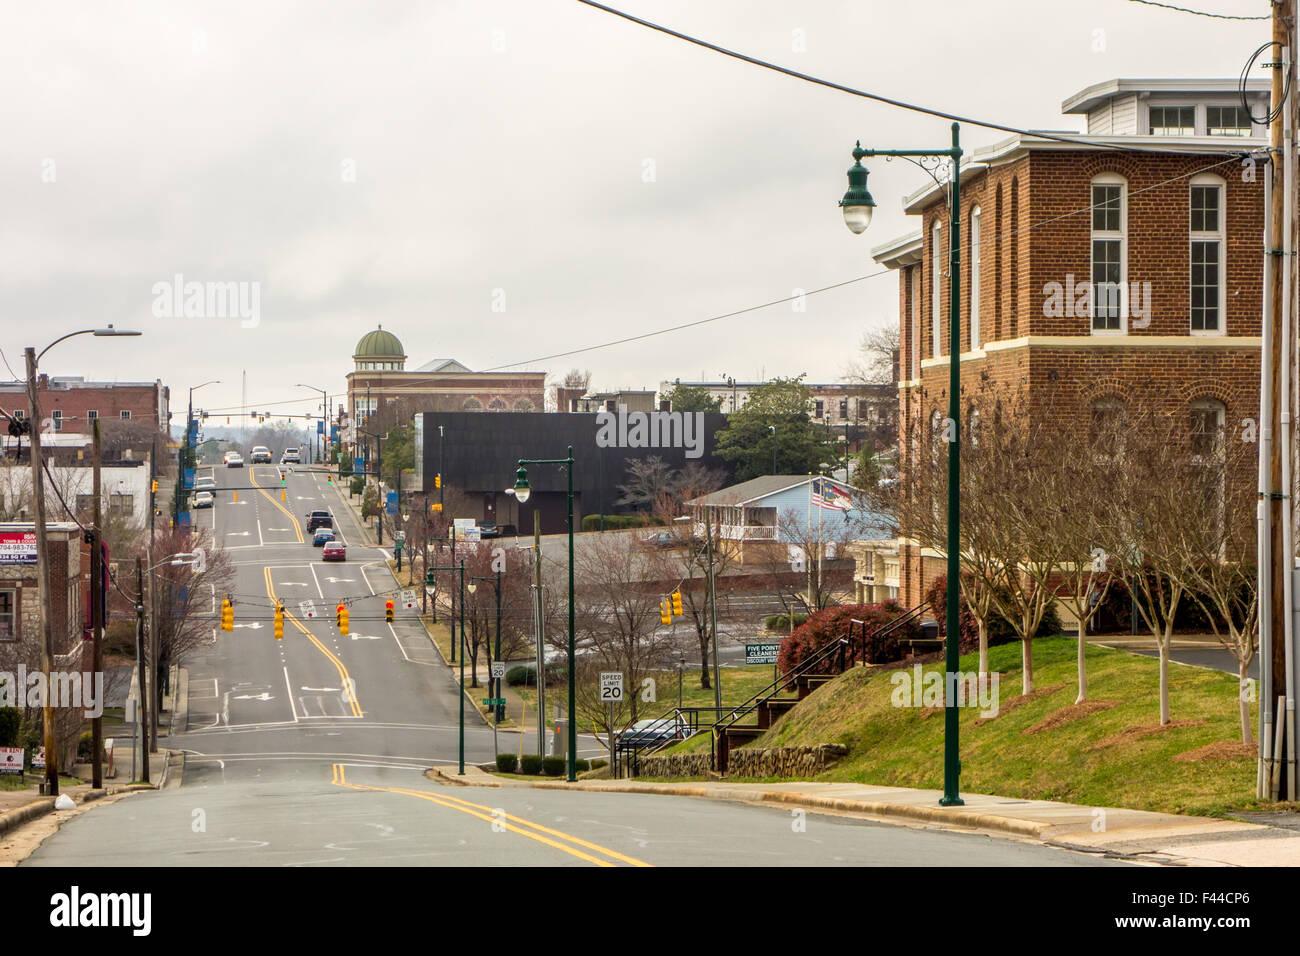 town of albermarle in north carolina - Stock Image